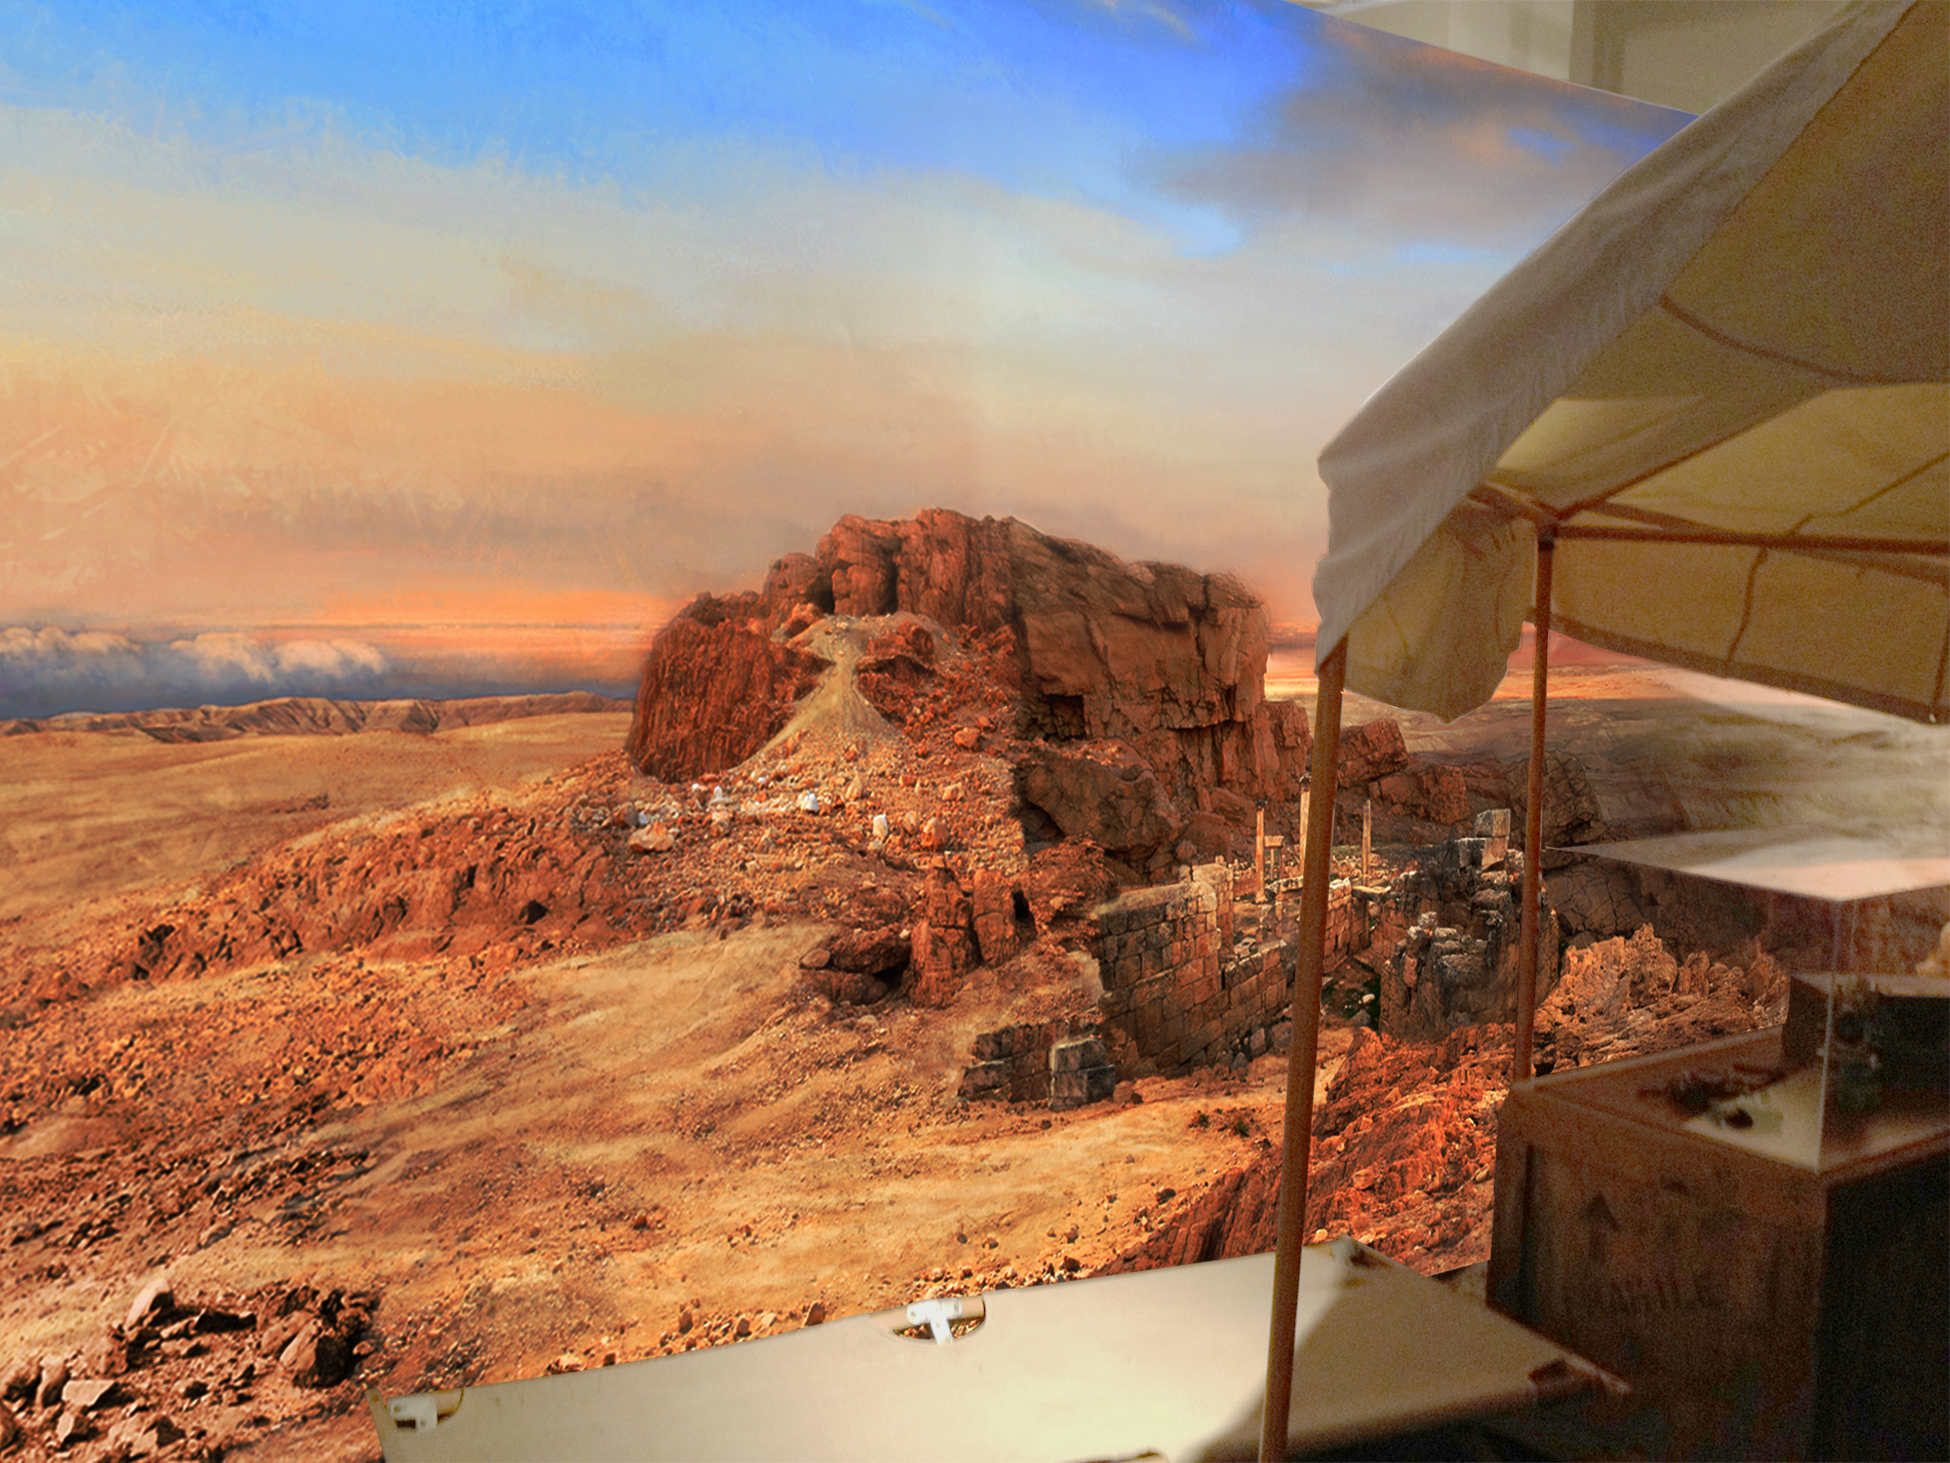 Southwestern Baptist Theological Seminary • Dead Sea Scrolls Exhibit